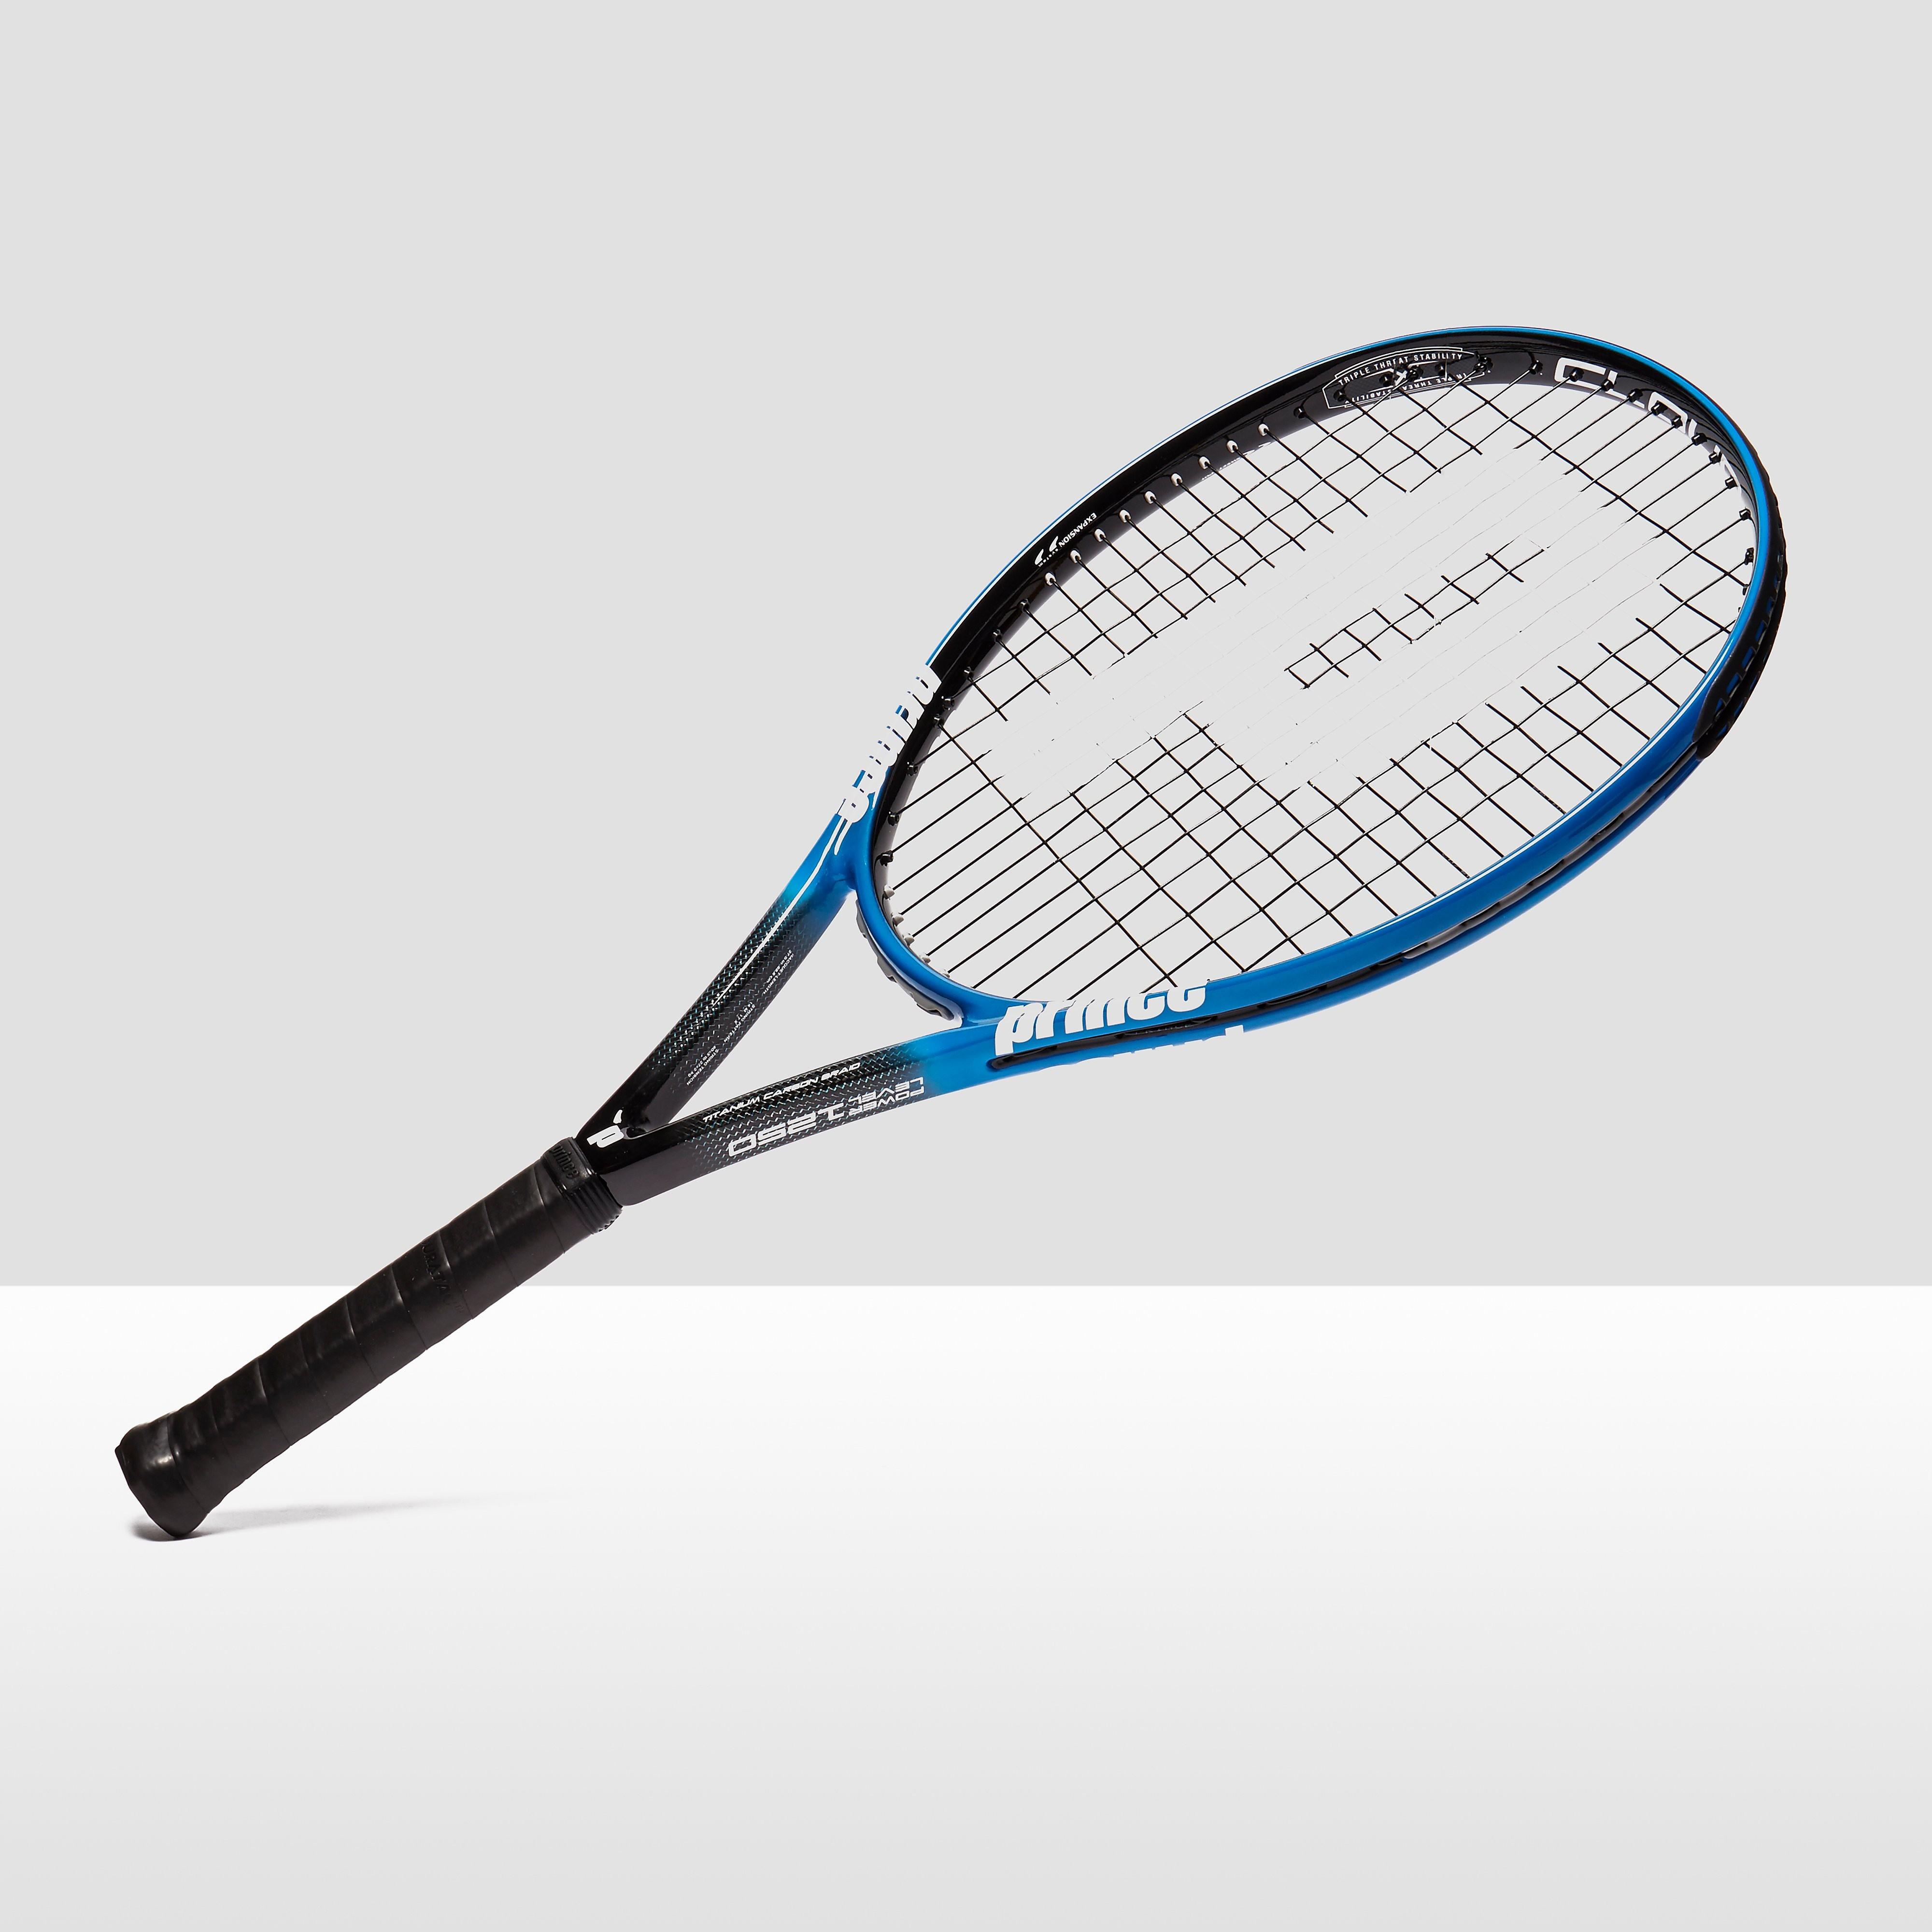 Prince Thunder Cloud 110 ESP Tennis Racket